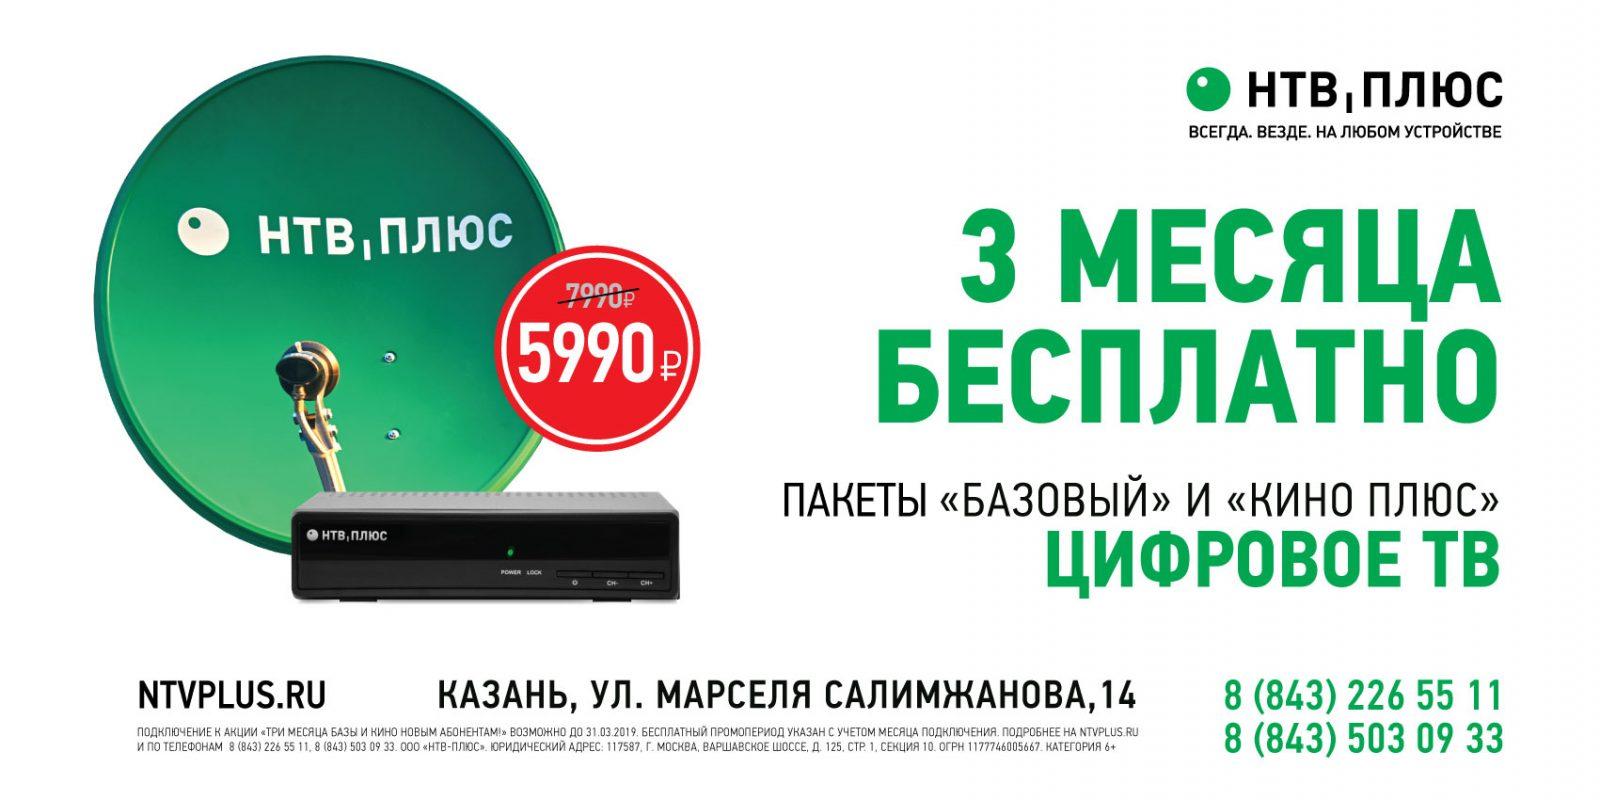 digital-tv-6x3 (1)